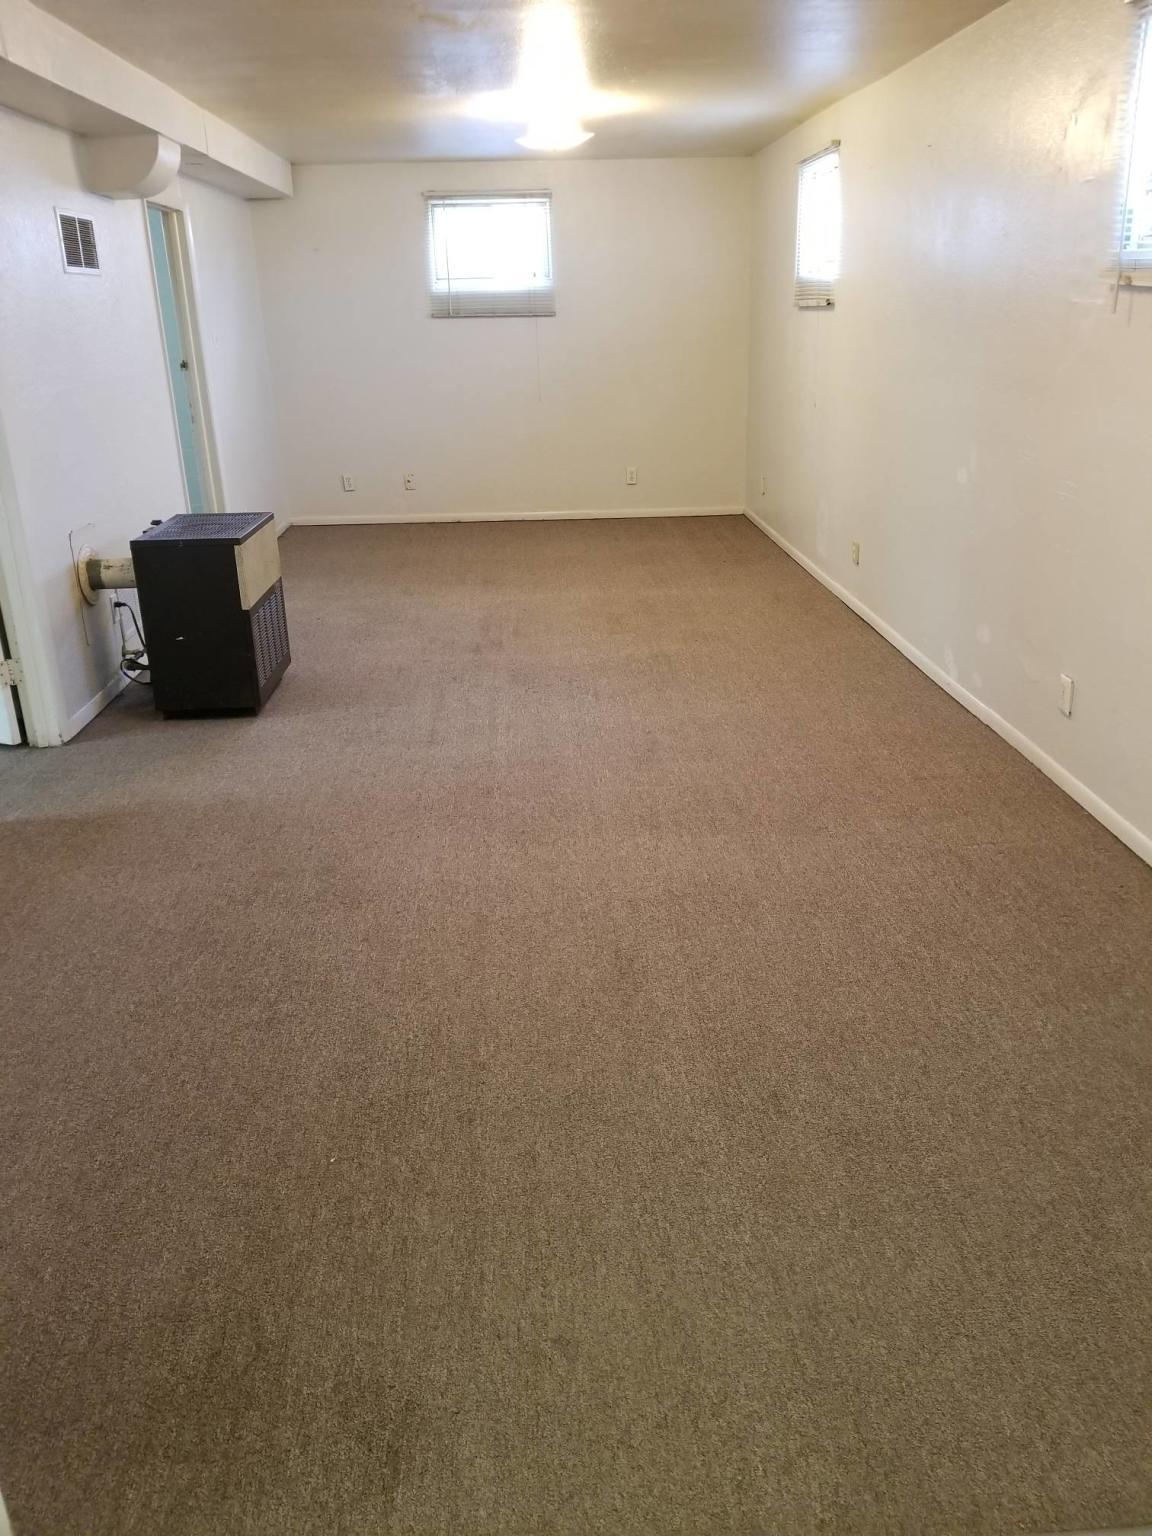 2700 7 Avenue - 2 Rentals - Garden City, CO   Trulia